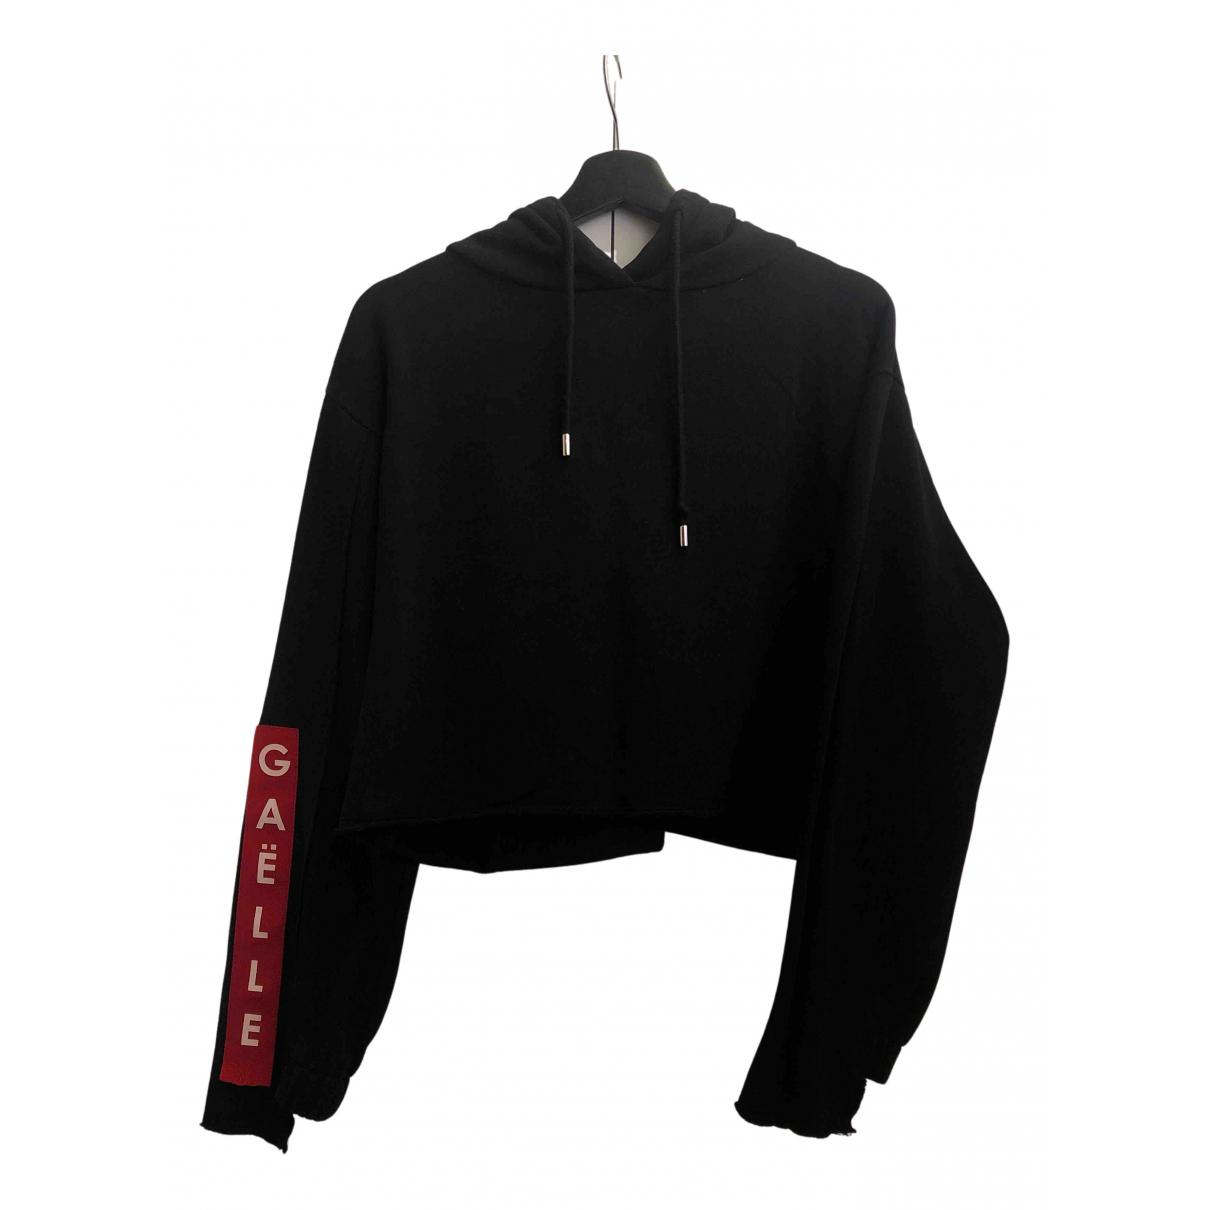 Gaelle Paris N Black Cotton Knitwear for Women 2 US